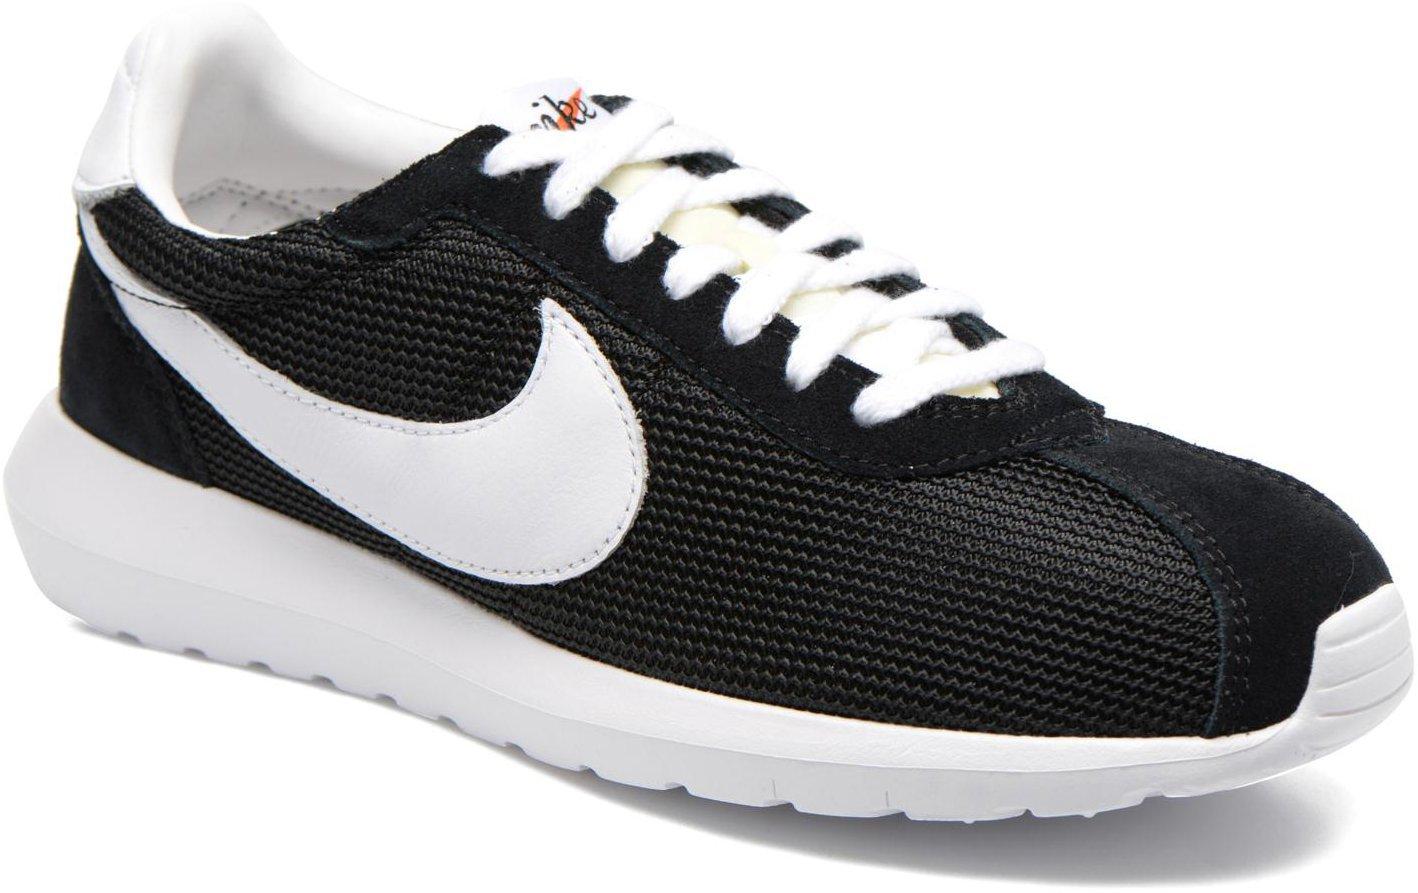 official photos 12cdb f3f65 Nike Roshe LD-1000 ab 49,95 € günstig im Preisvergleich kaufen